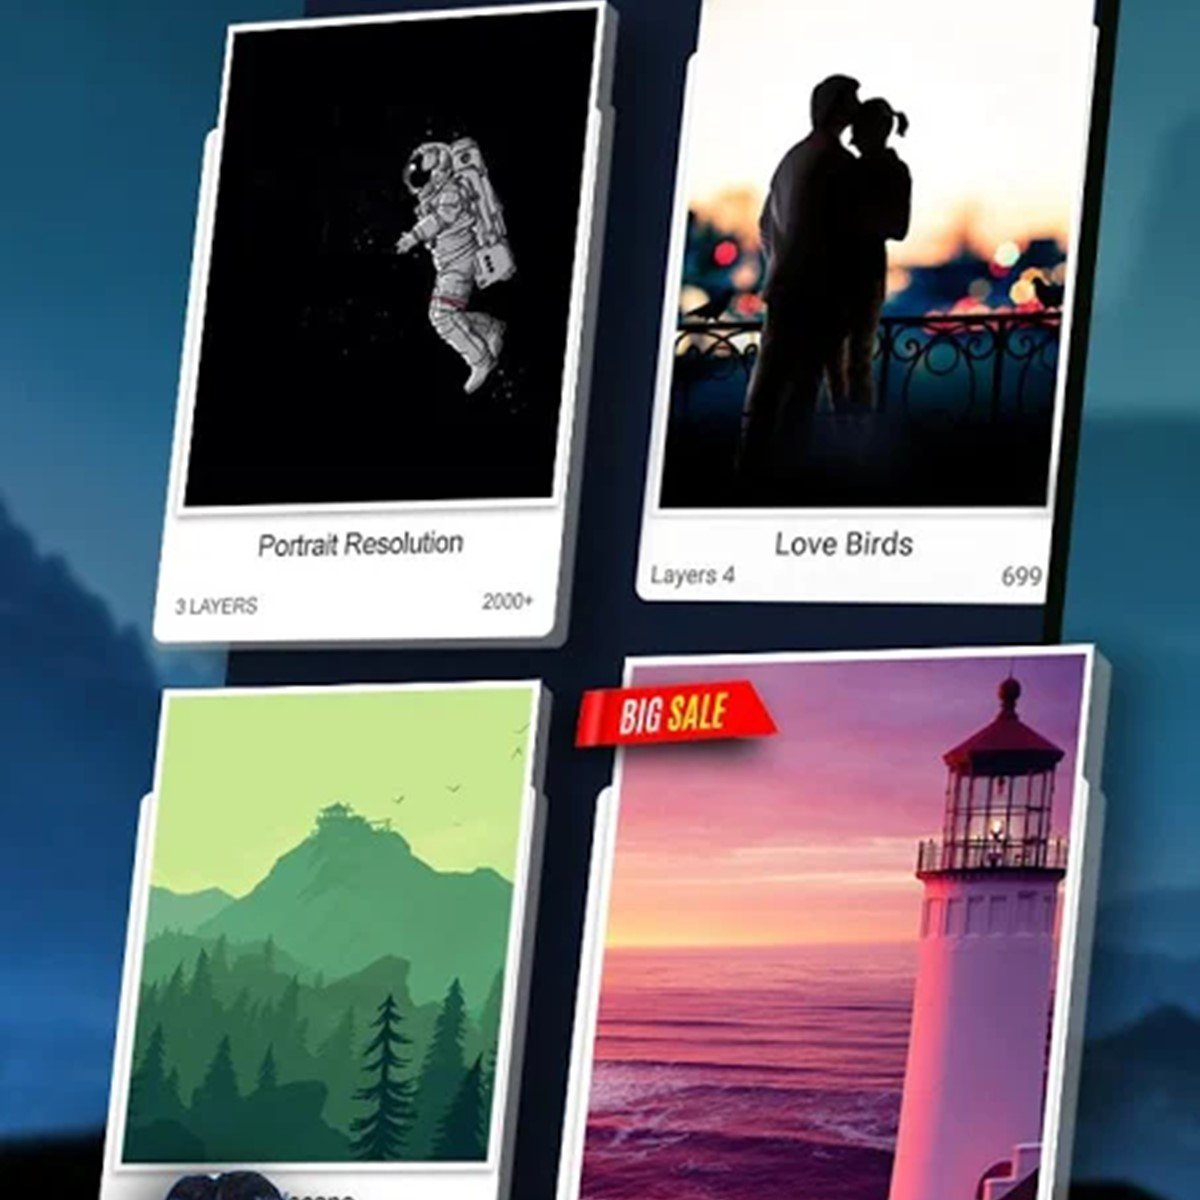 3D Wallpaper Parallax Alternatives And Similar Apps